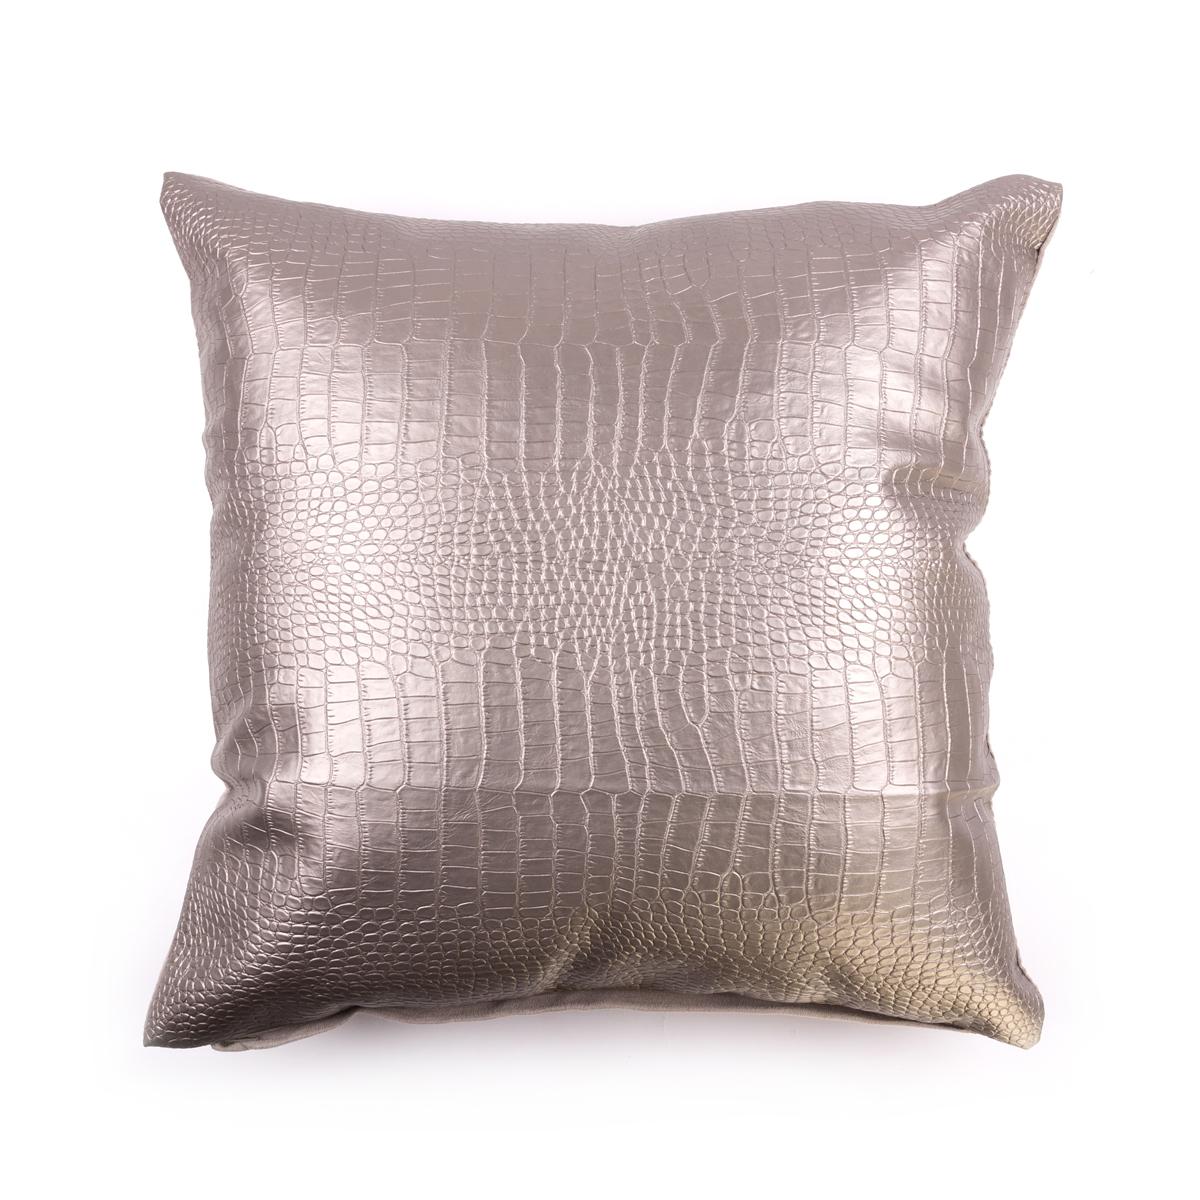 Купить Декоративные подушки Arya, Декоративная наволочка Aeryn Цвет: Серый (45х45 см), Турция, Полиэстер